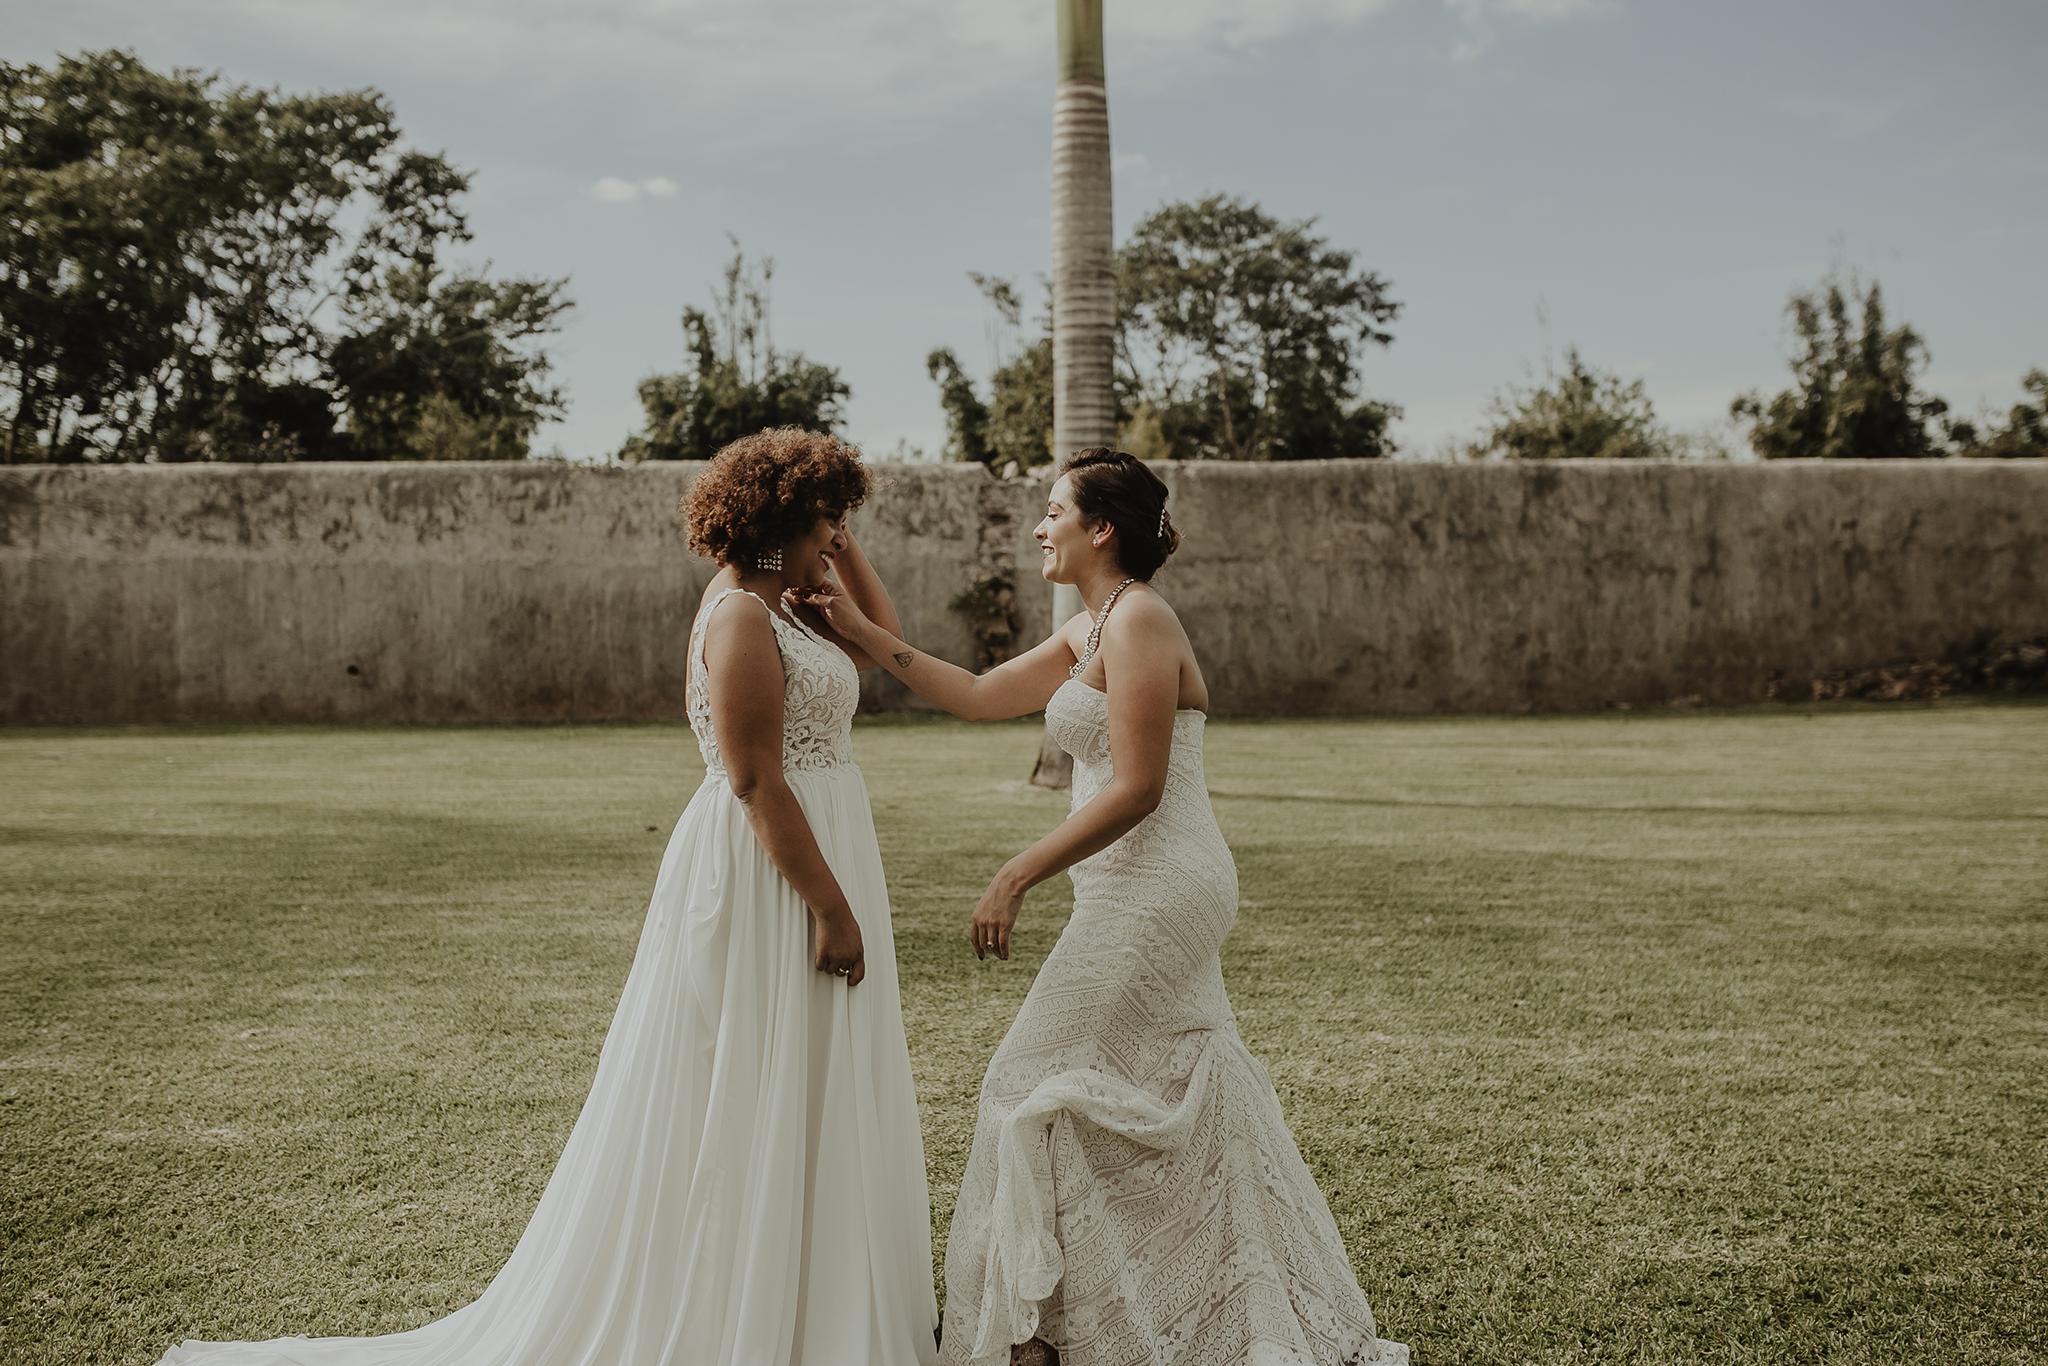 0129V&Aslide_HaciendaSacChic_WeddingGay_WeddingDstination_MeridaYucatan_HaciendasMerida_BodasMexico_BodasYucatan_Boda_Destino.jpg